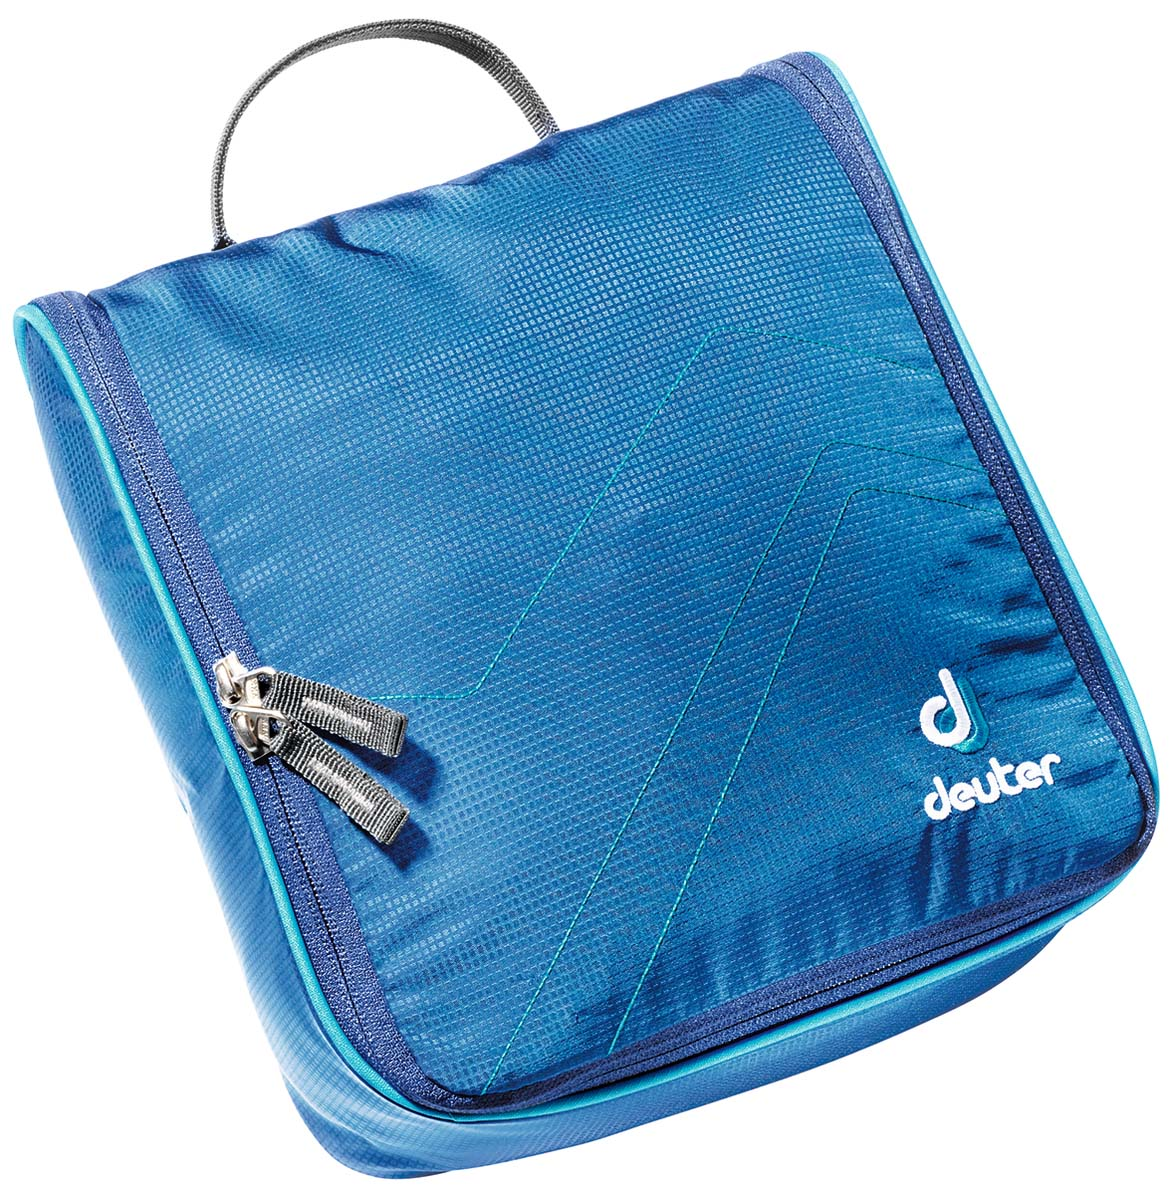 Косметичка Deuter Accessories Wash Center II, цвет: светло-голубой, бирюзовый, 25 см х 24 см х 9 см